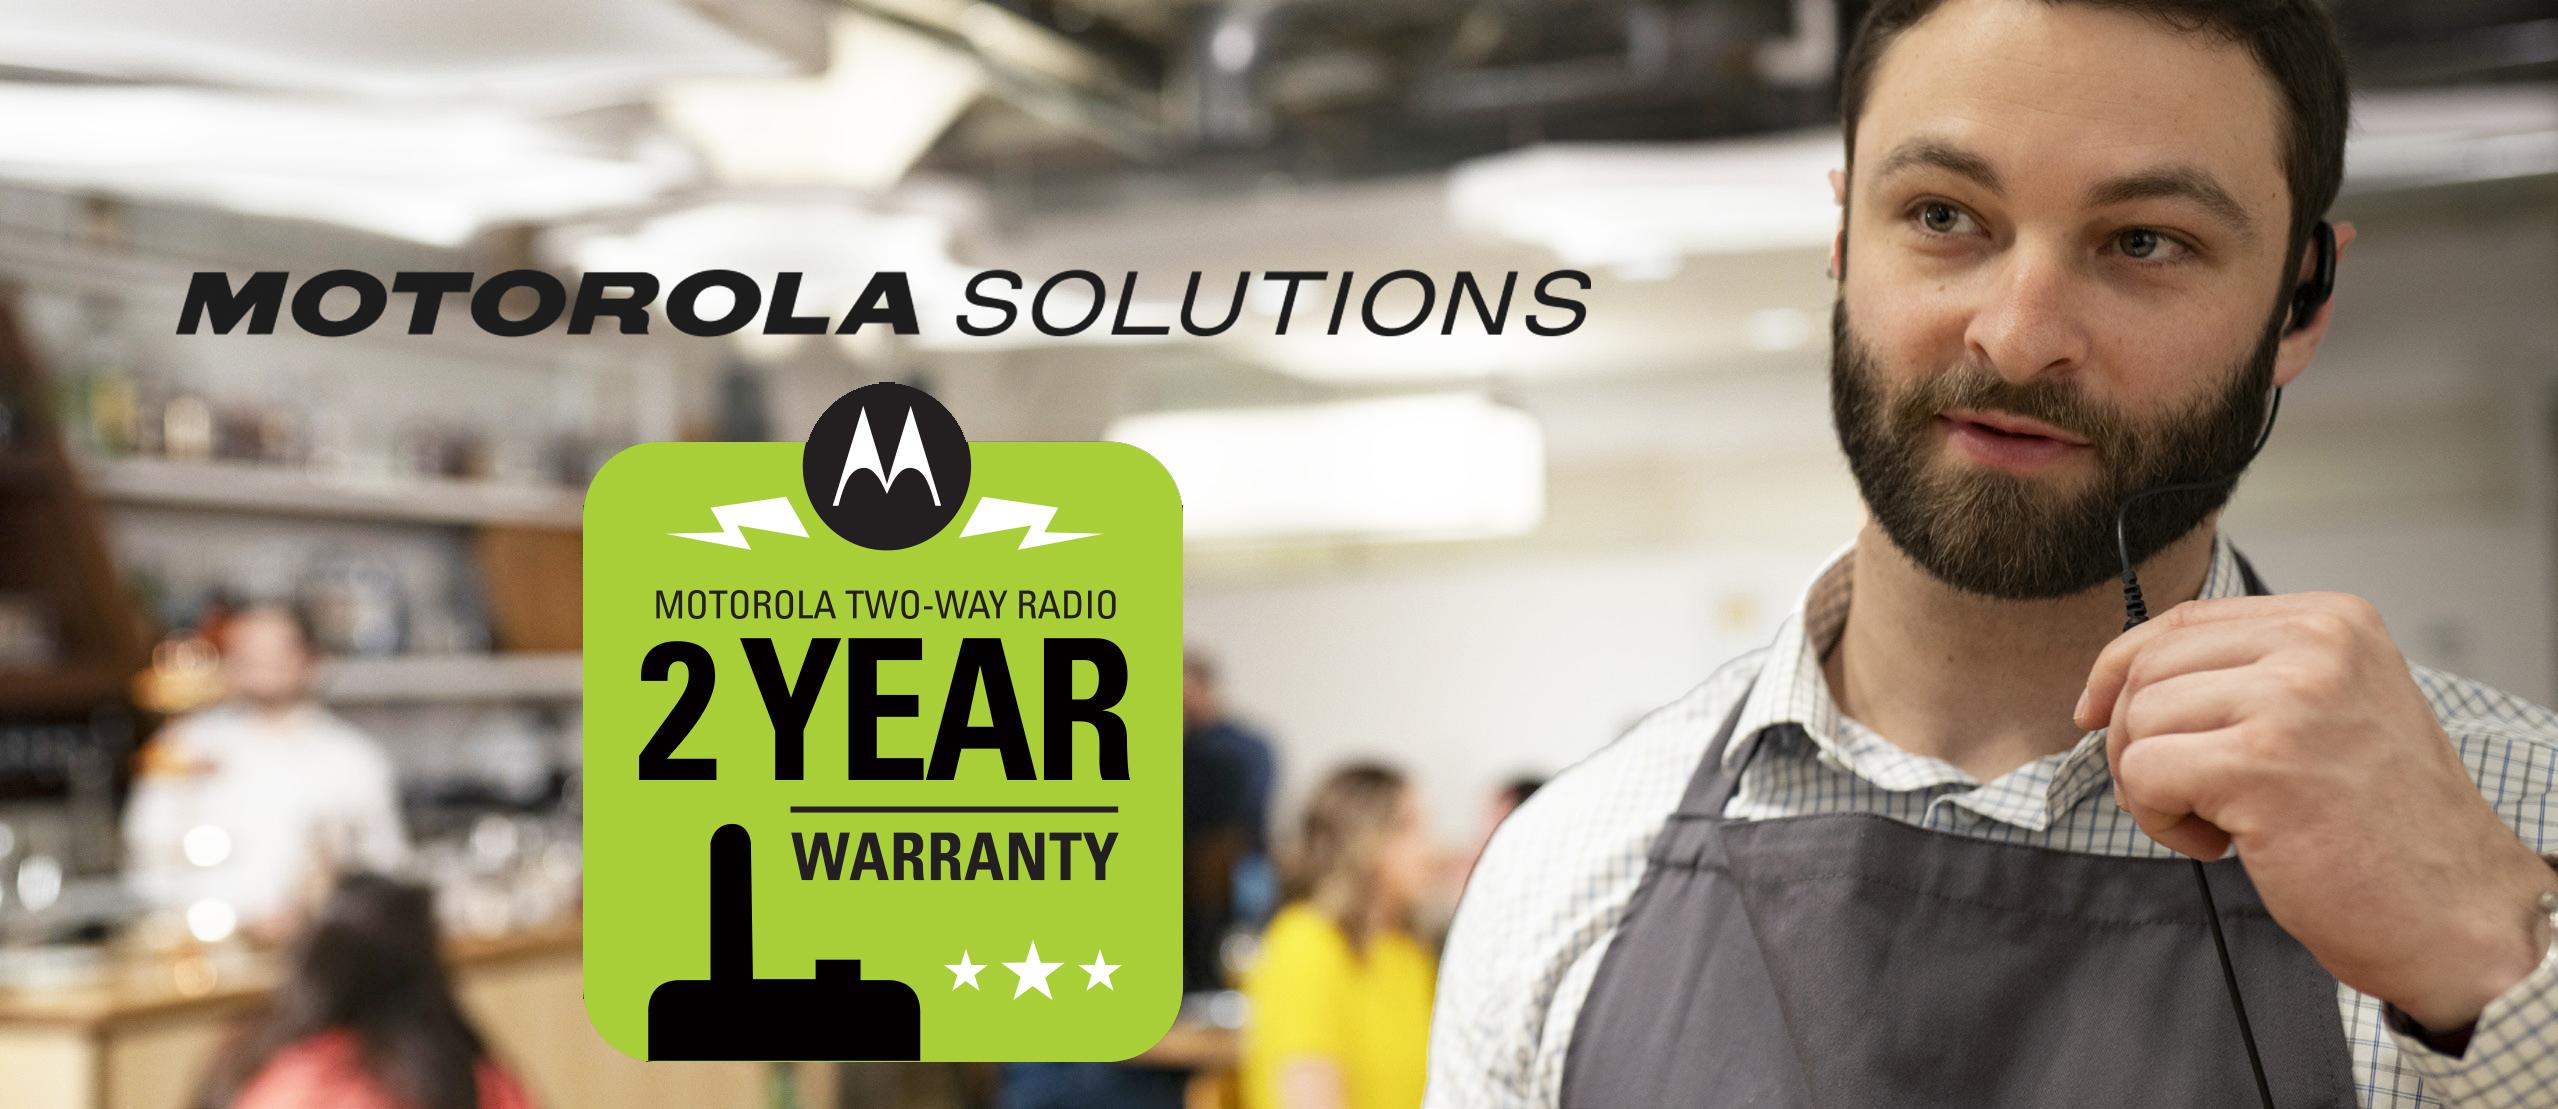 motorola-main-page-with-warranty-statement.jpg